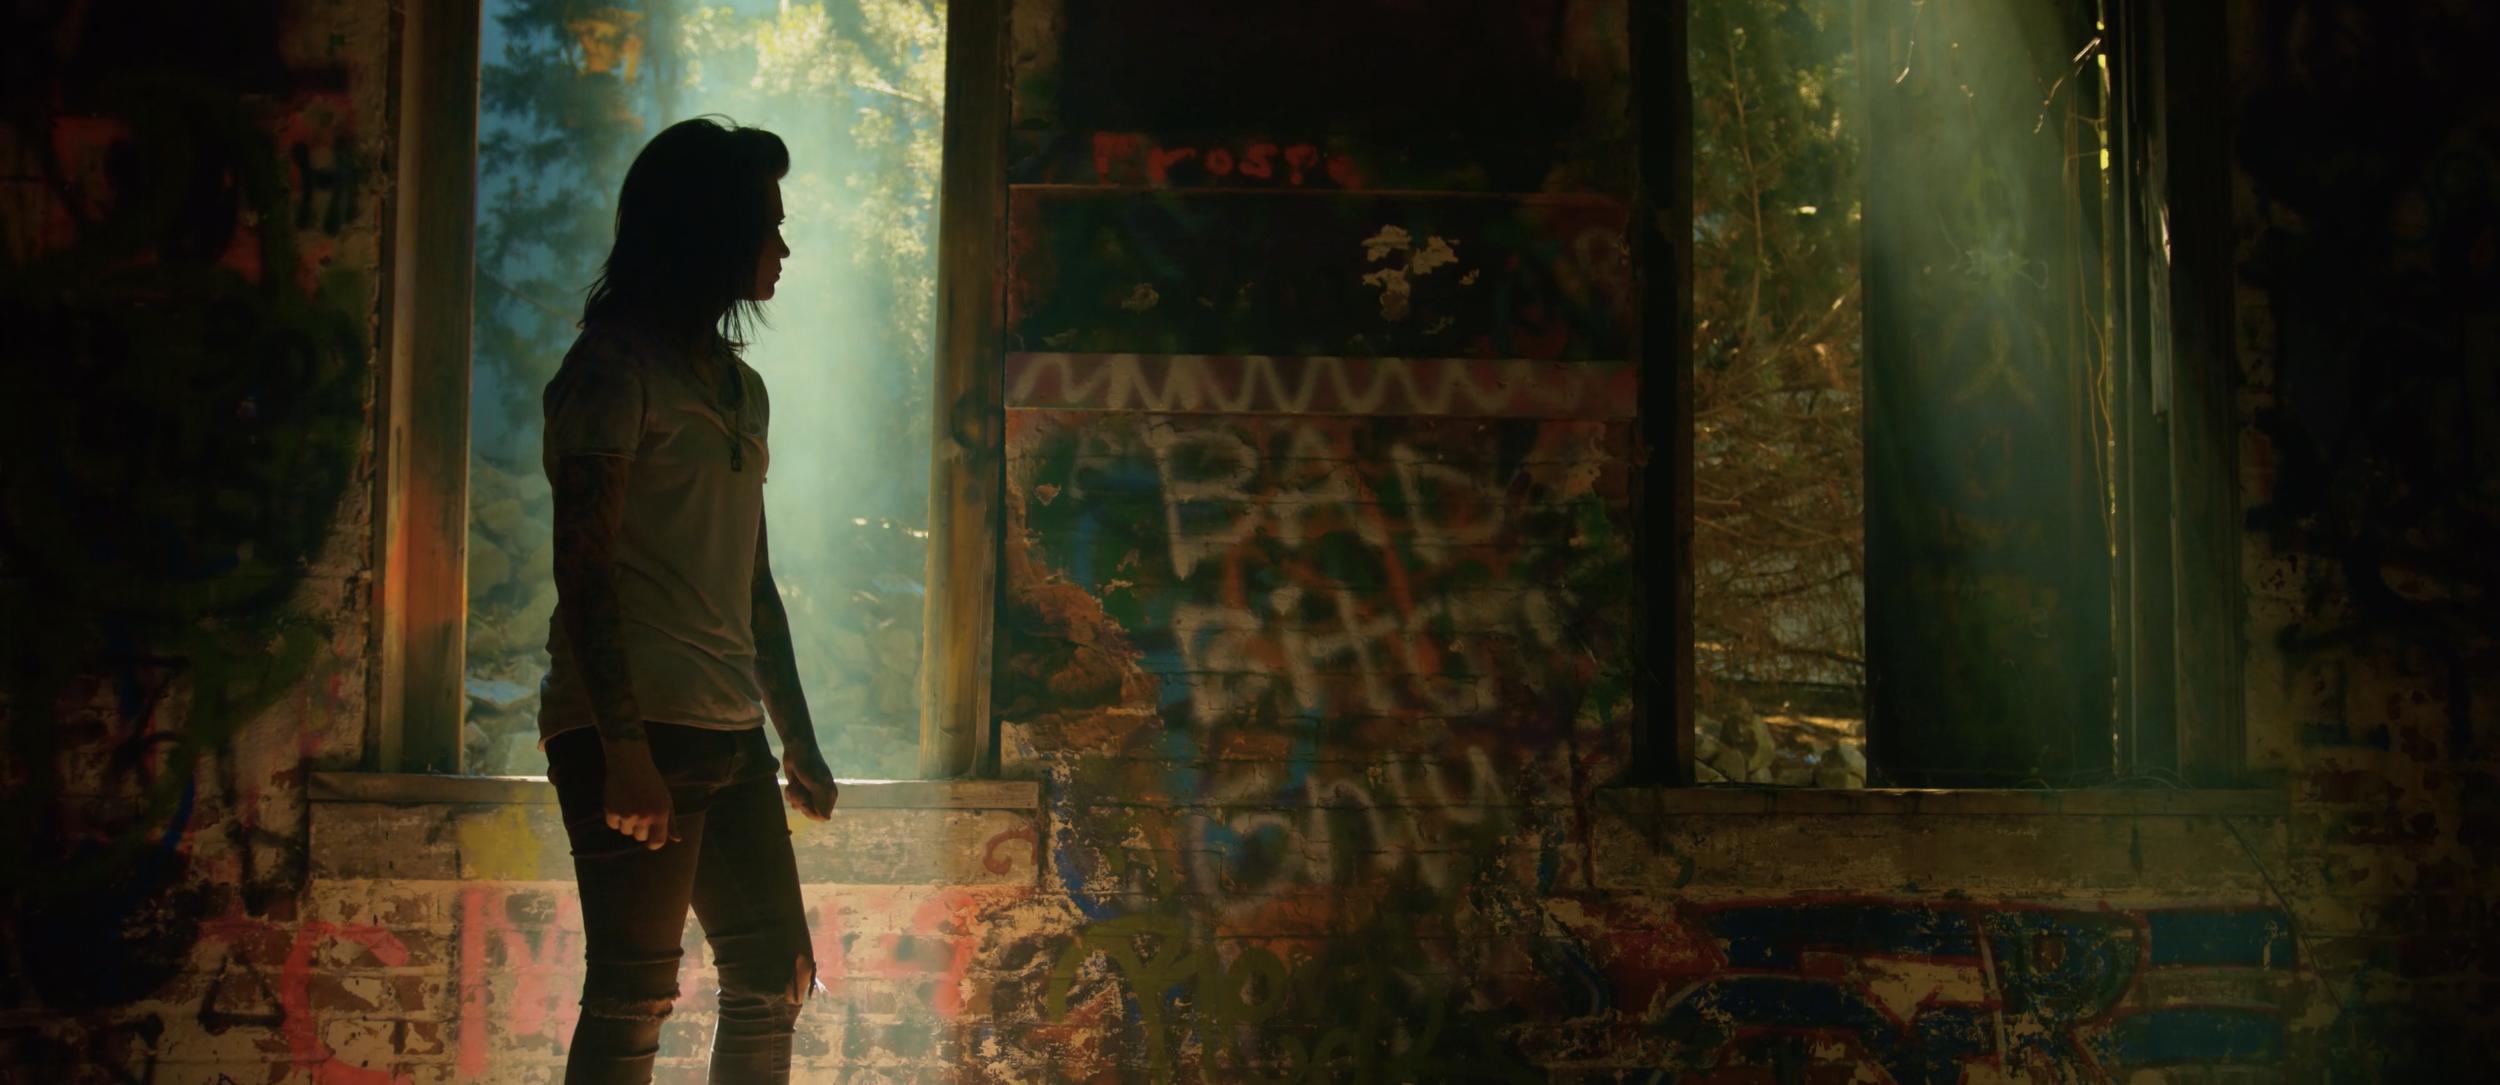 Renee Phoenix Swallow Music Video Window